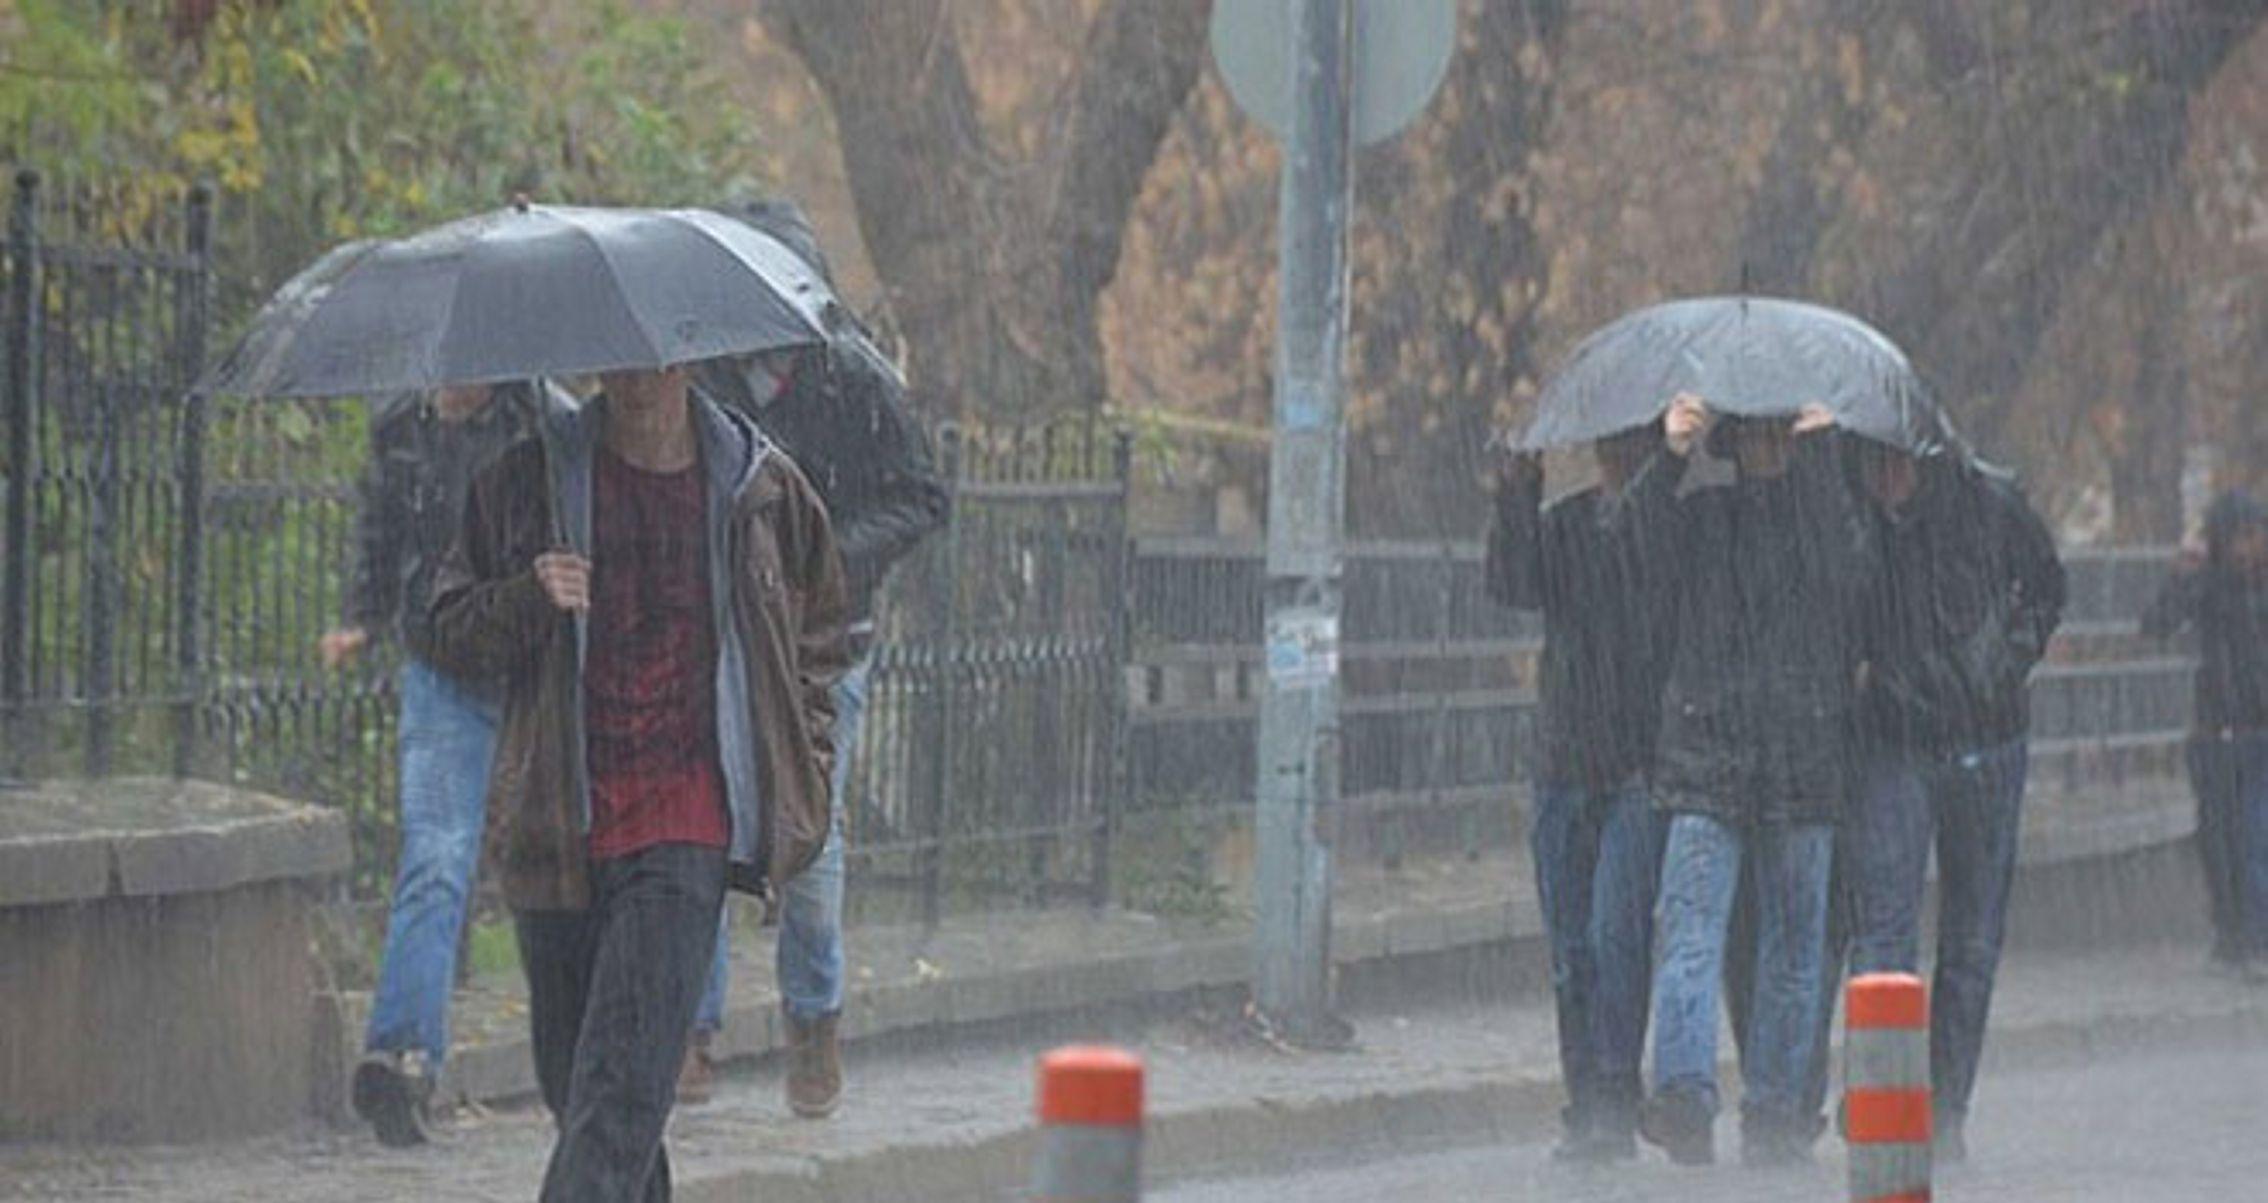 7 il için kuvvetli yağış uyarısı !